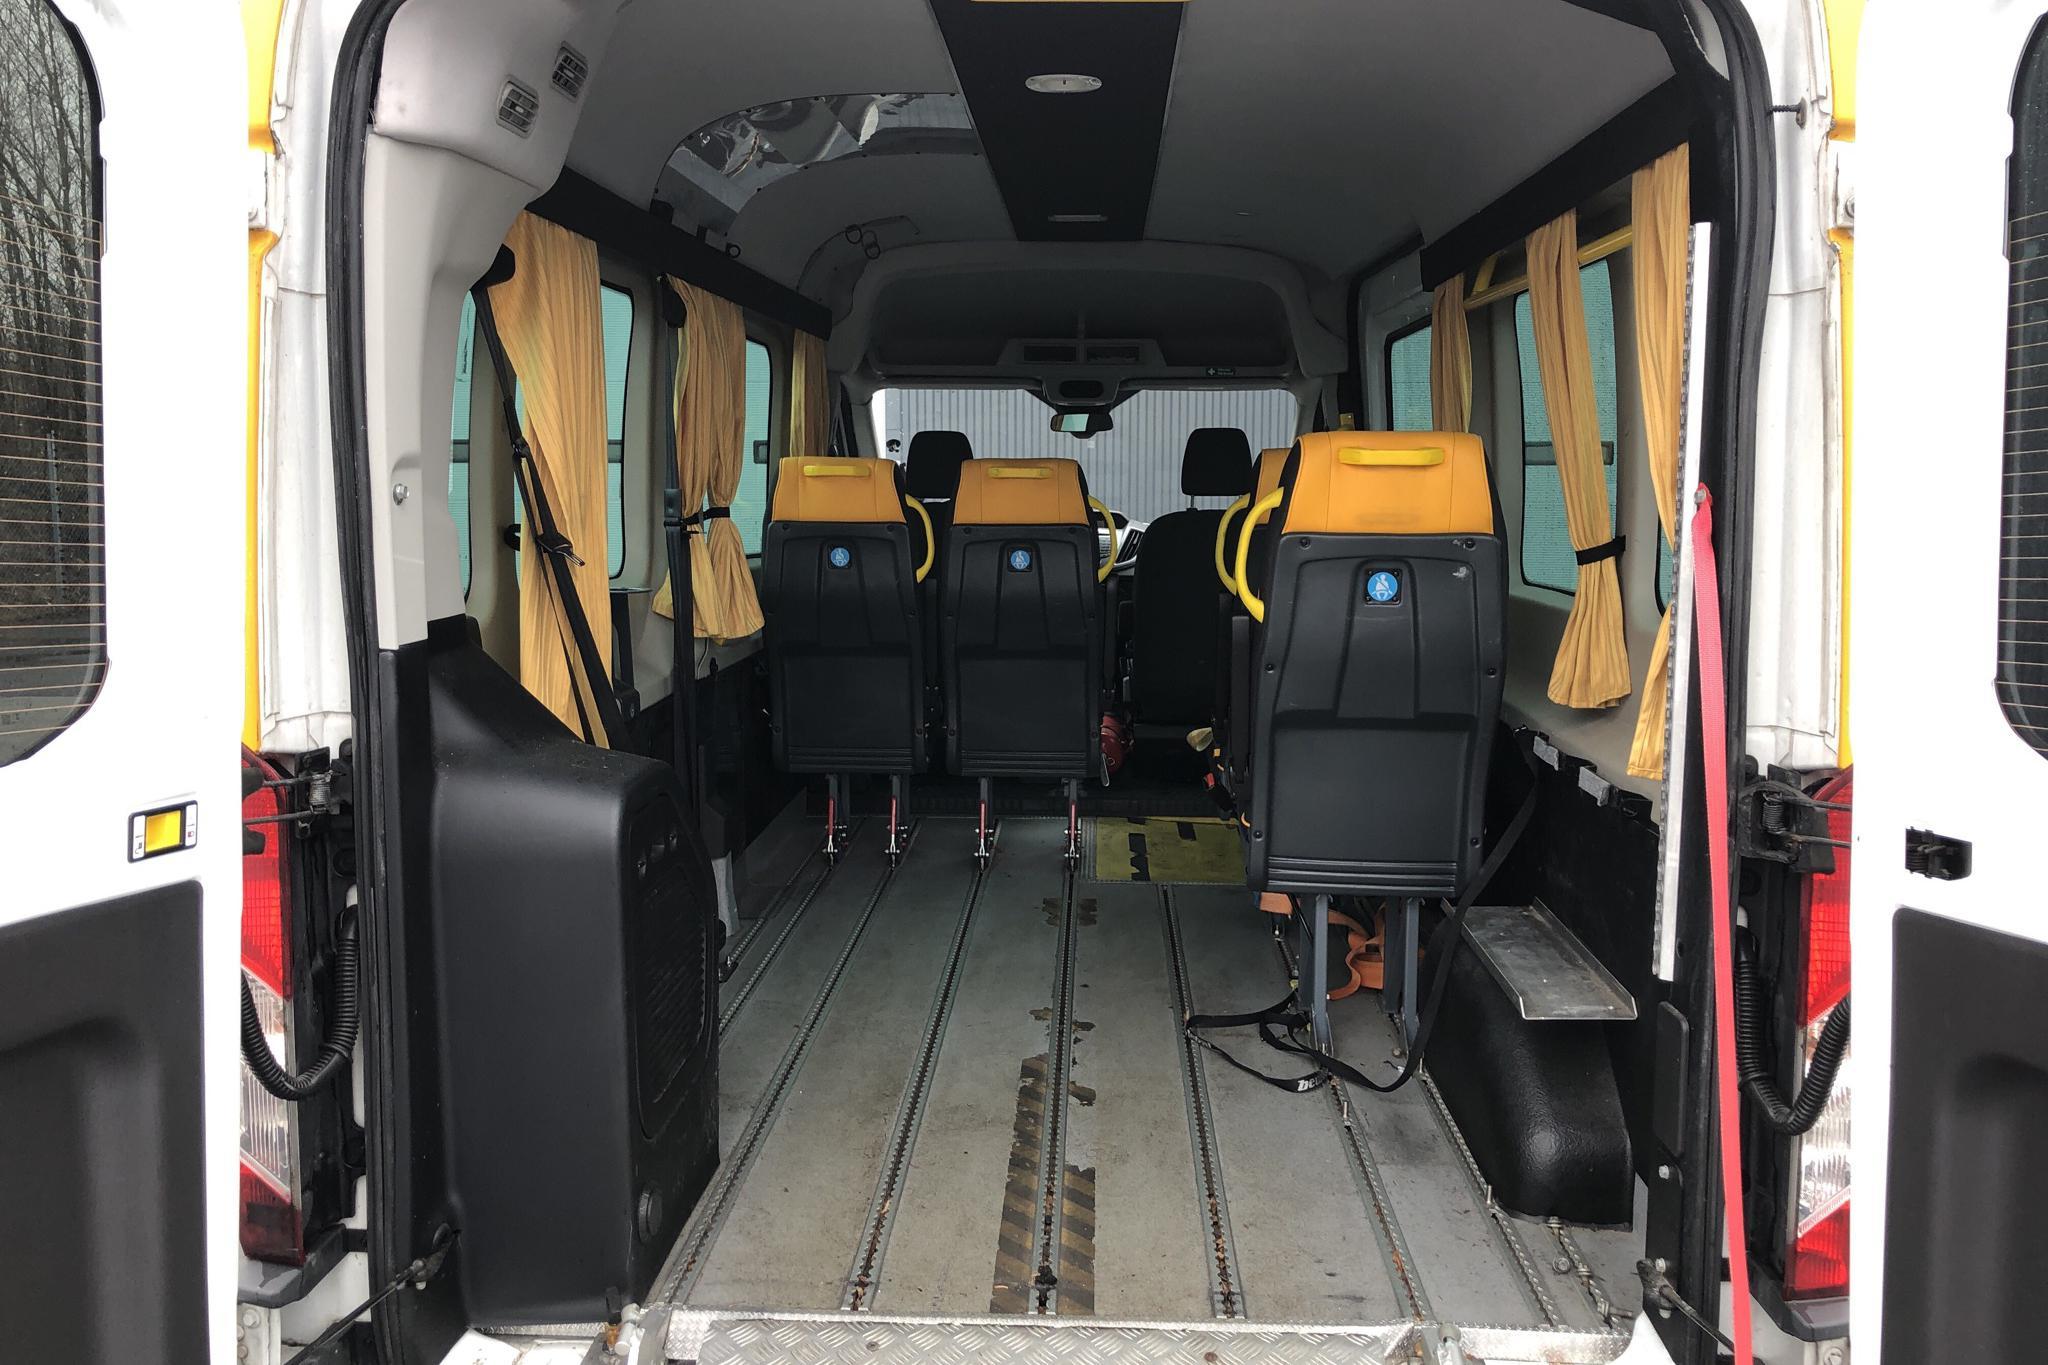 Ford Transit 350 2.0 TDCi 2WD (130hk) - 537 290 km - Manual - white - 2017